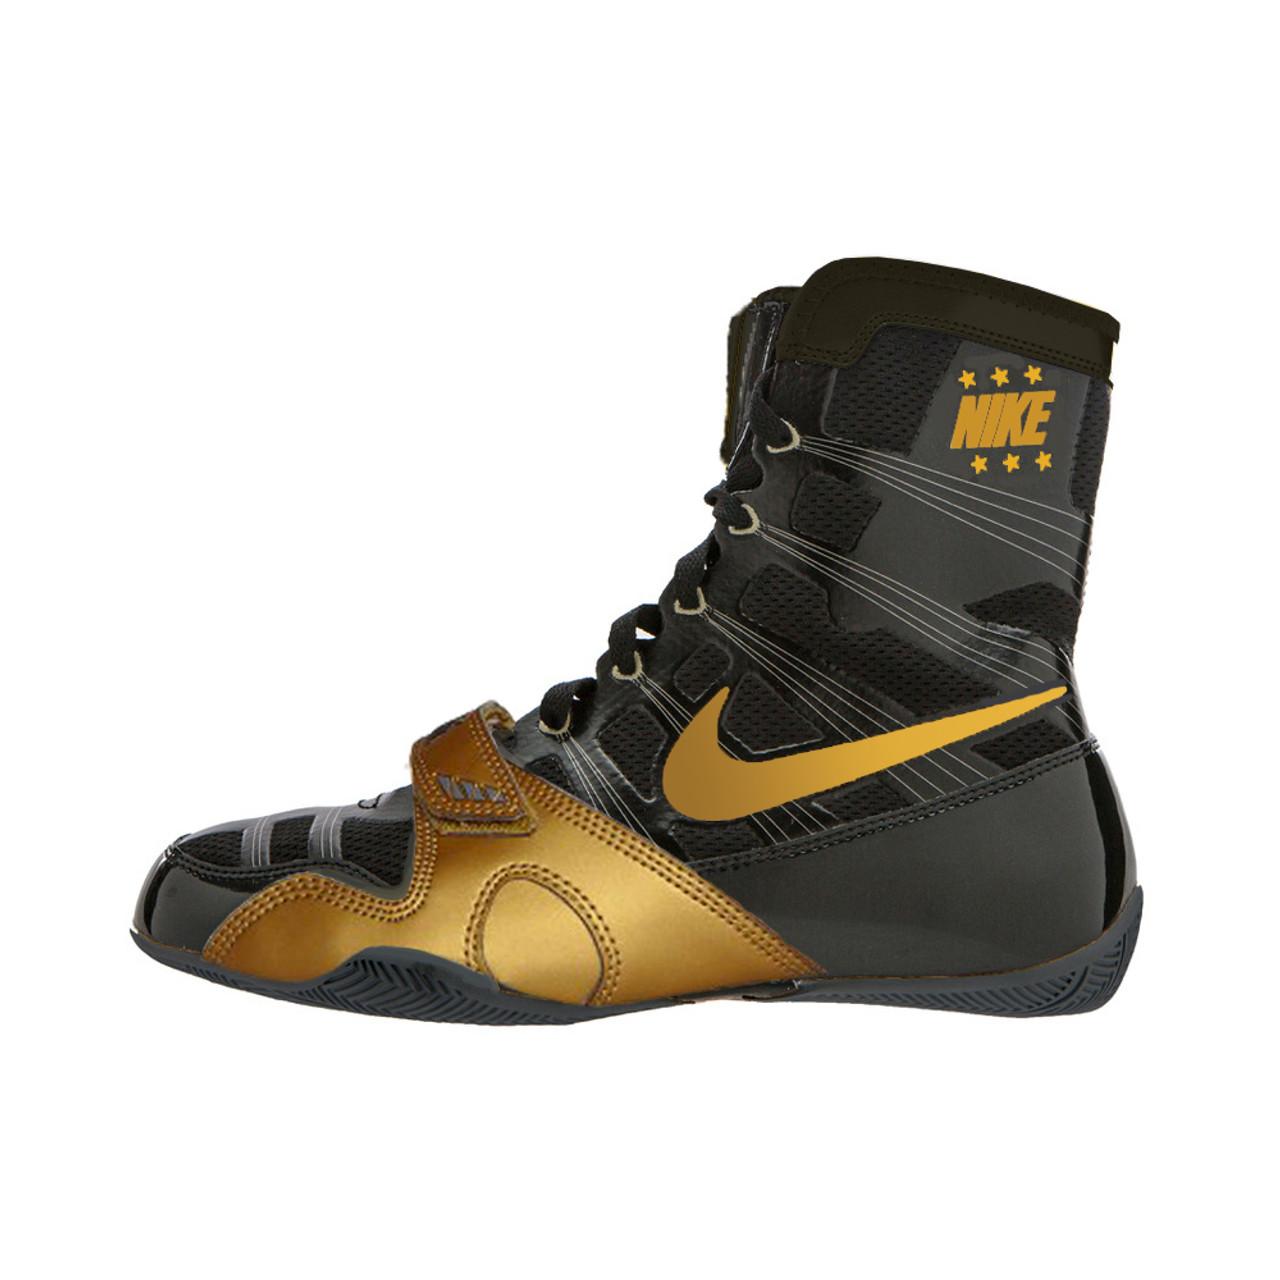 Nike HyperKO Limited Edition - Black/Metallic Gold